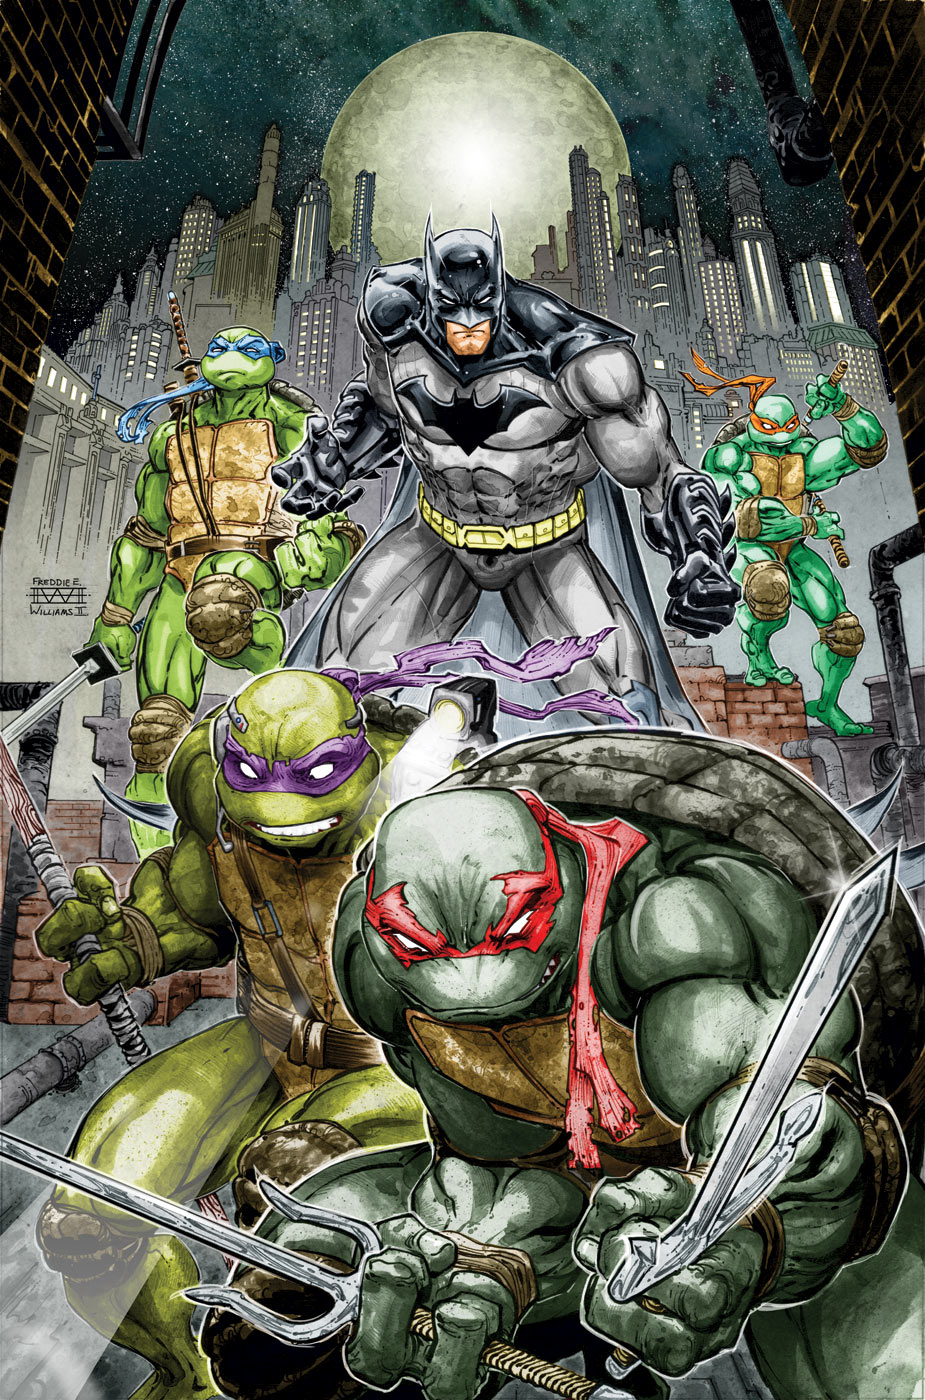 FEWII_BatmanTMNT.jpg